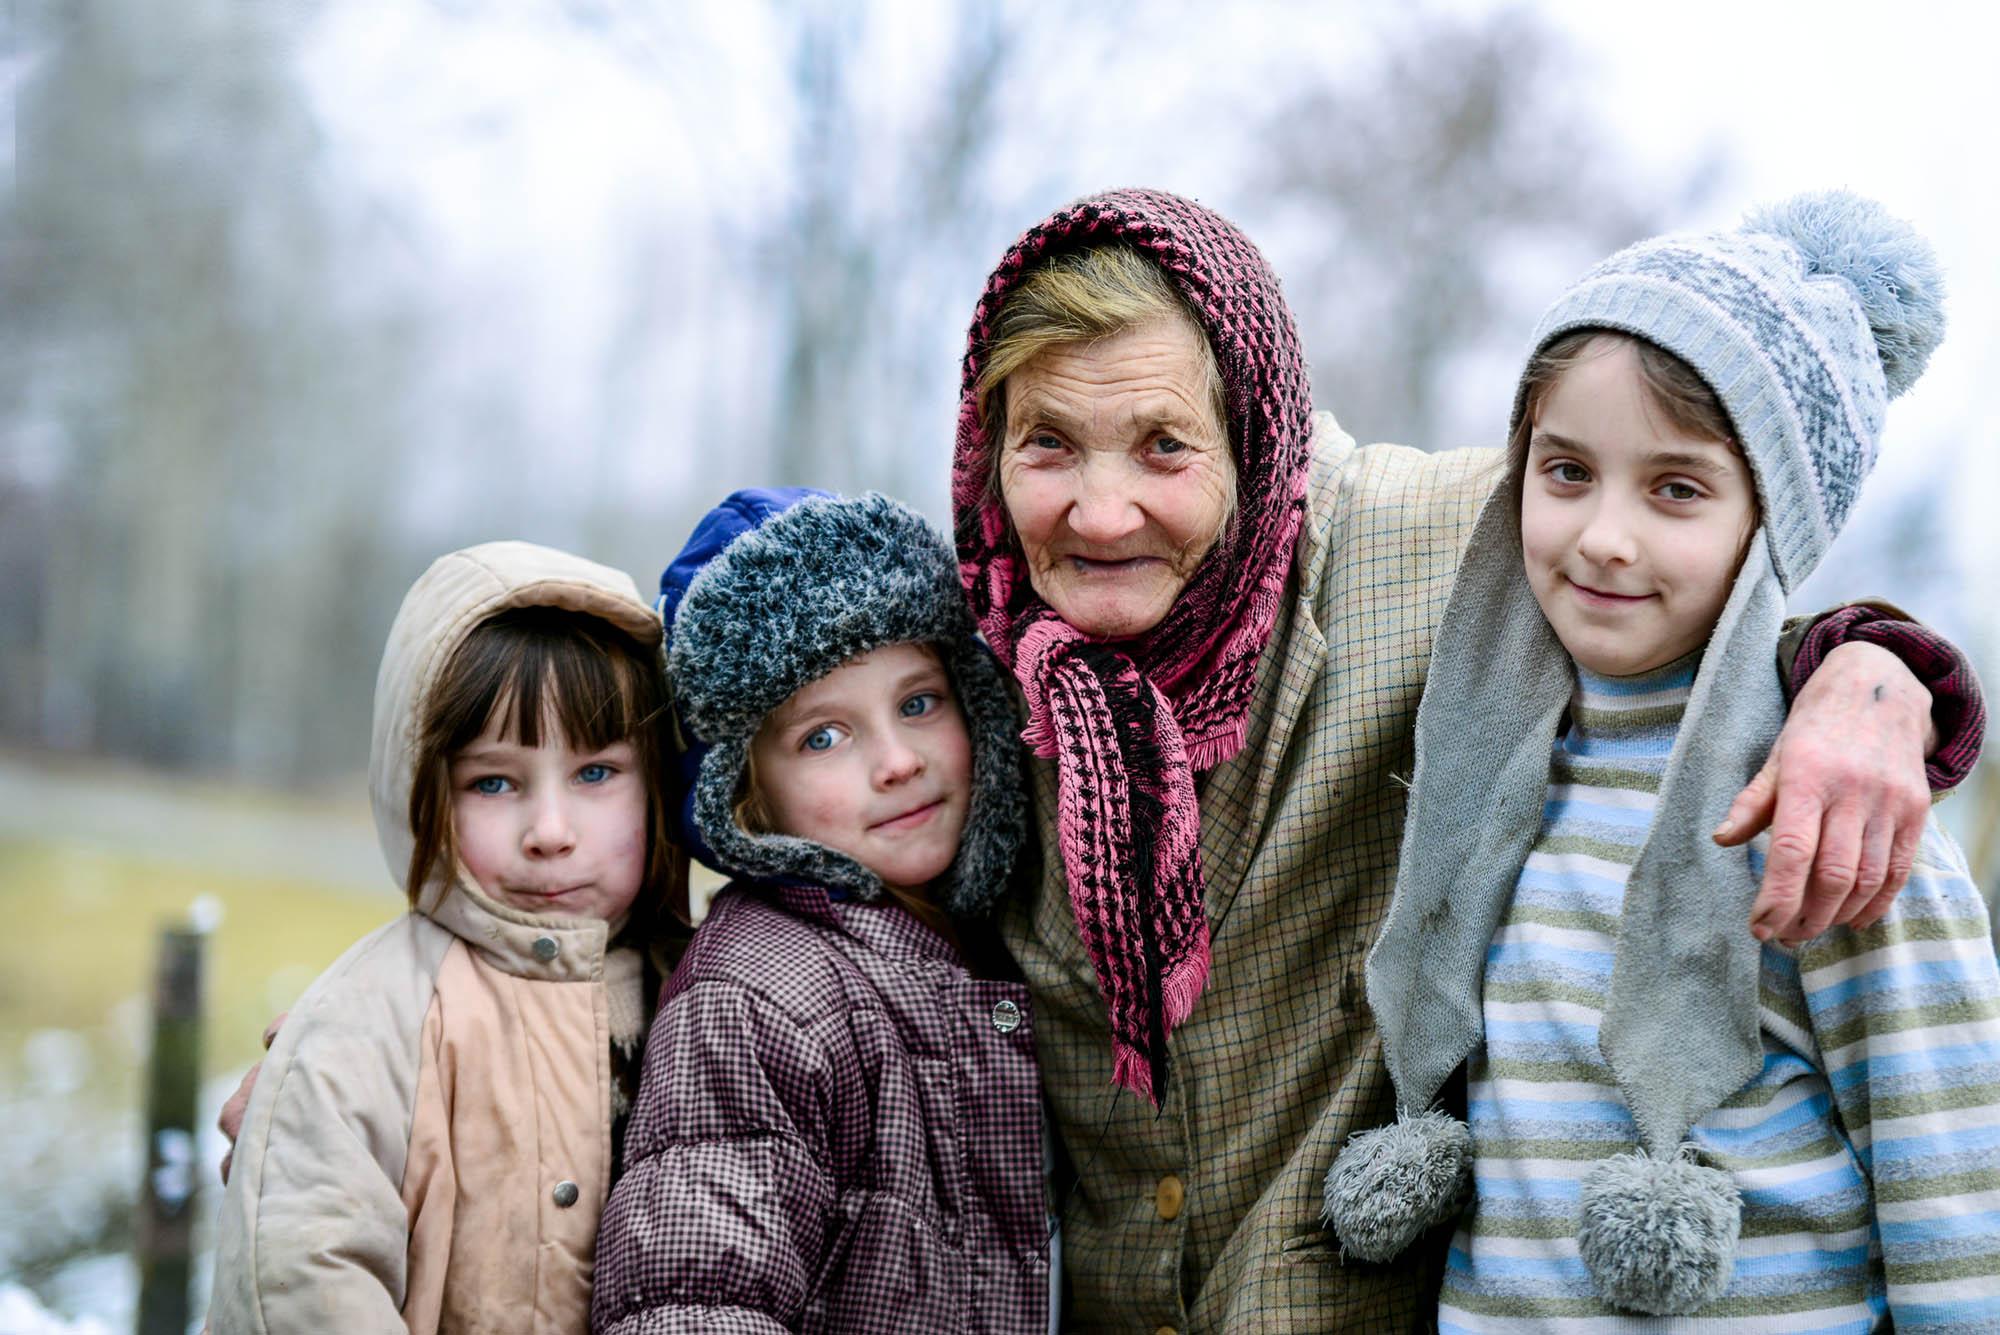 Детства сладкий сон. ©Валерий Куртанич - https://www.facebook.com/kurtanich.valeriy?fref=ts